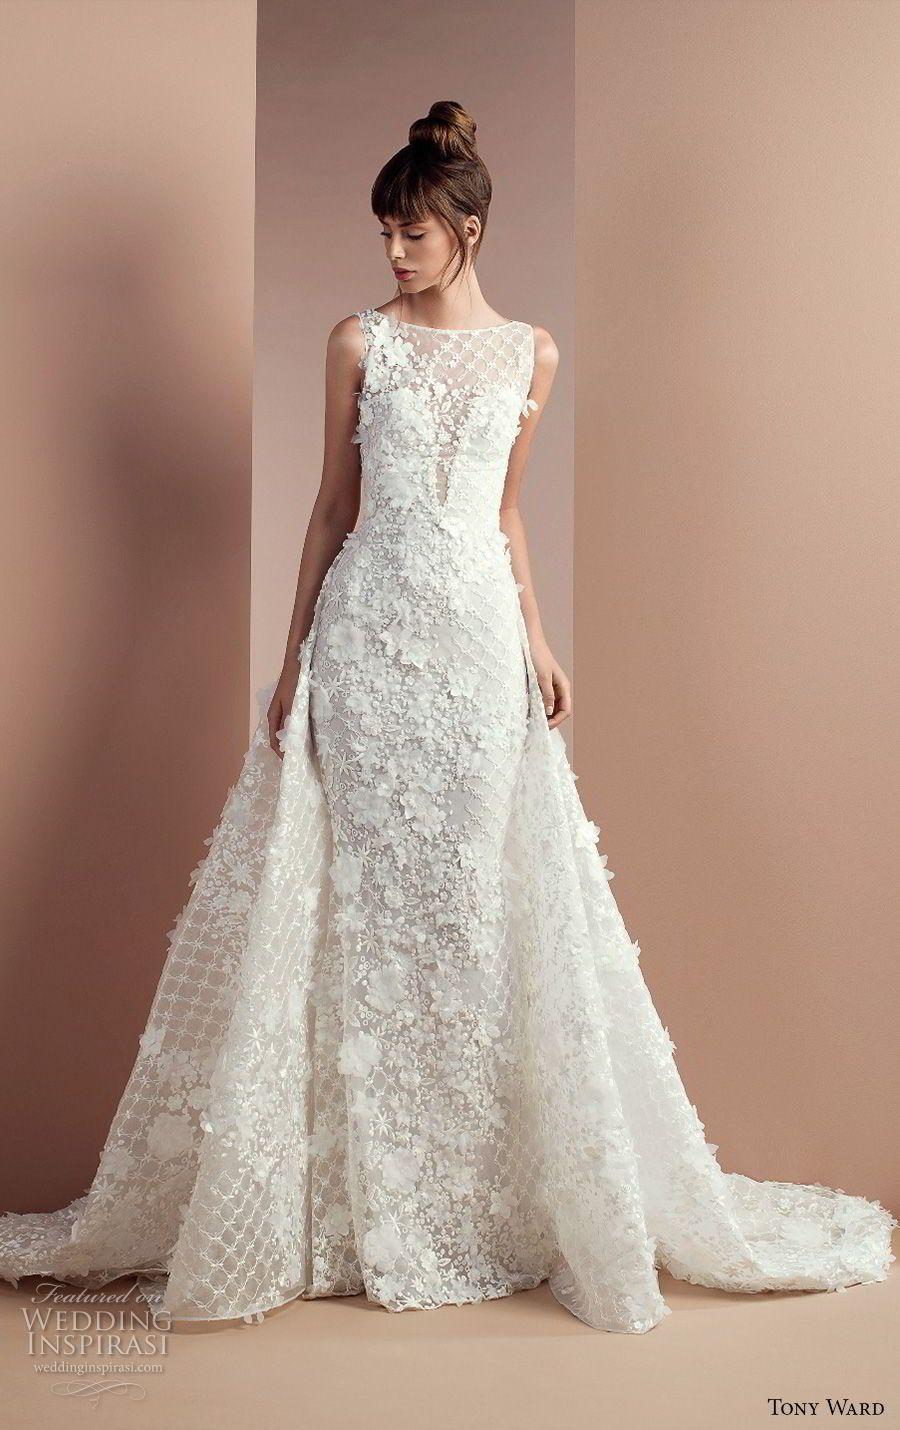 Antique cream wedding dress  tony ward  bridal sleevless illusion bateau sweetheart neckline